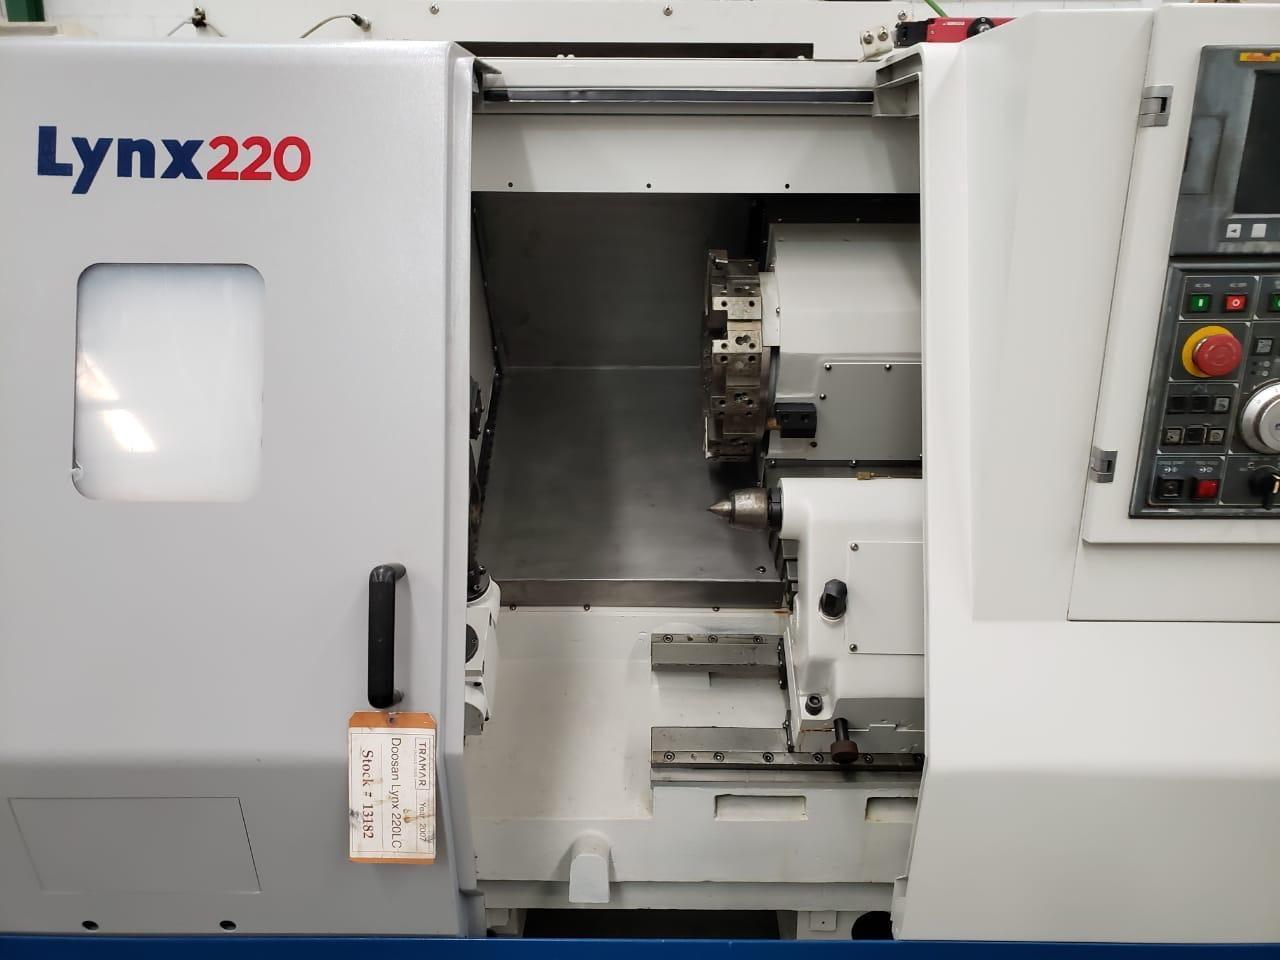 2007 DOOSAN Lynx 220LC - CNC Horizontal Lathe